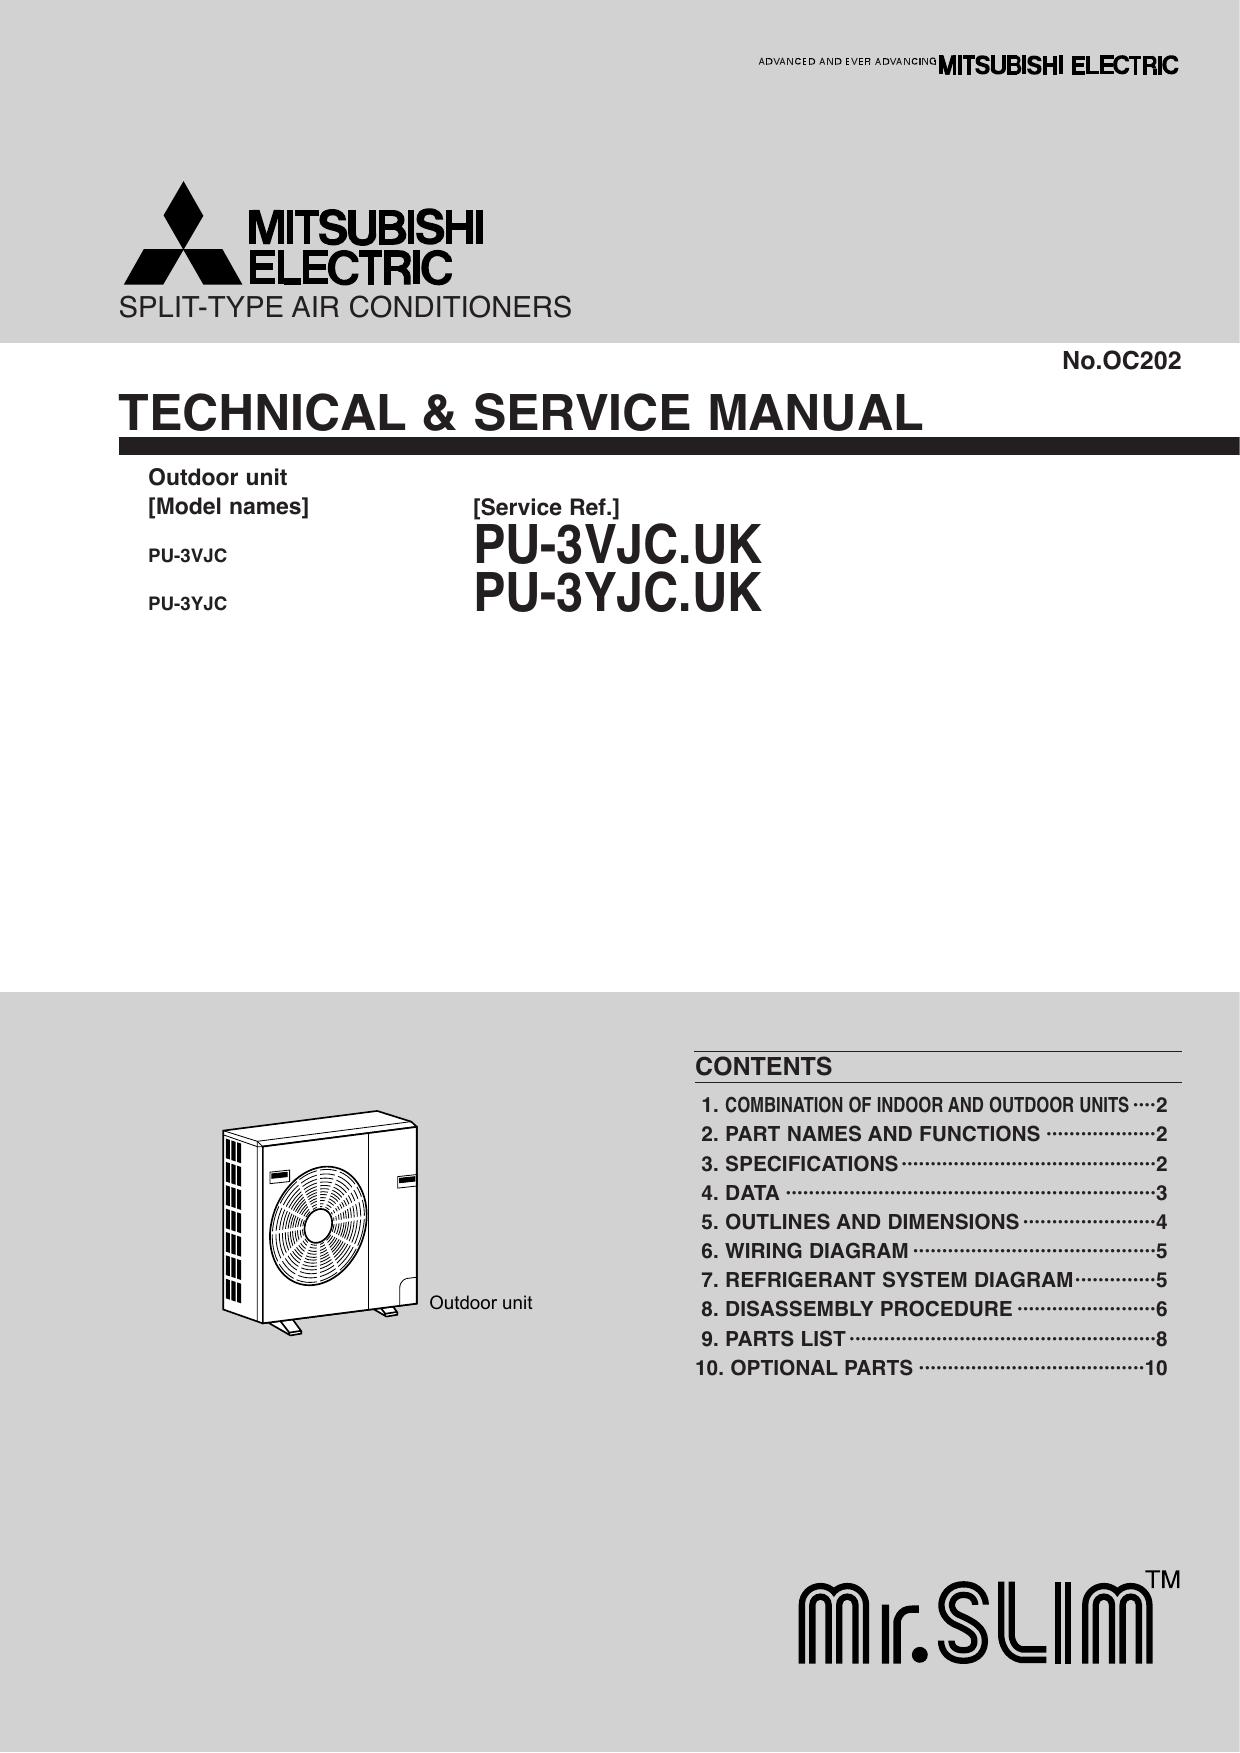 PU-3VJC.UK PU-3YJC.UK | manualzz.com on